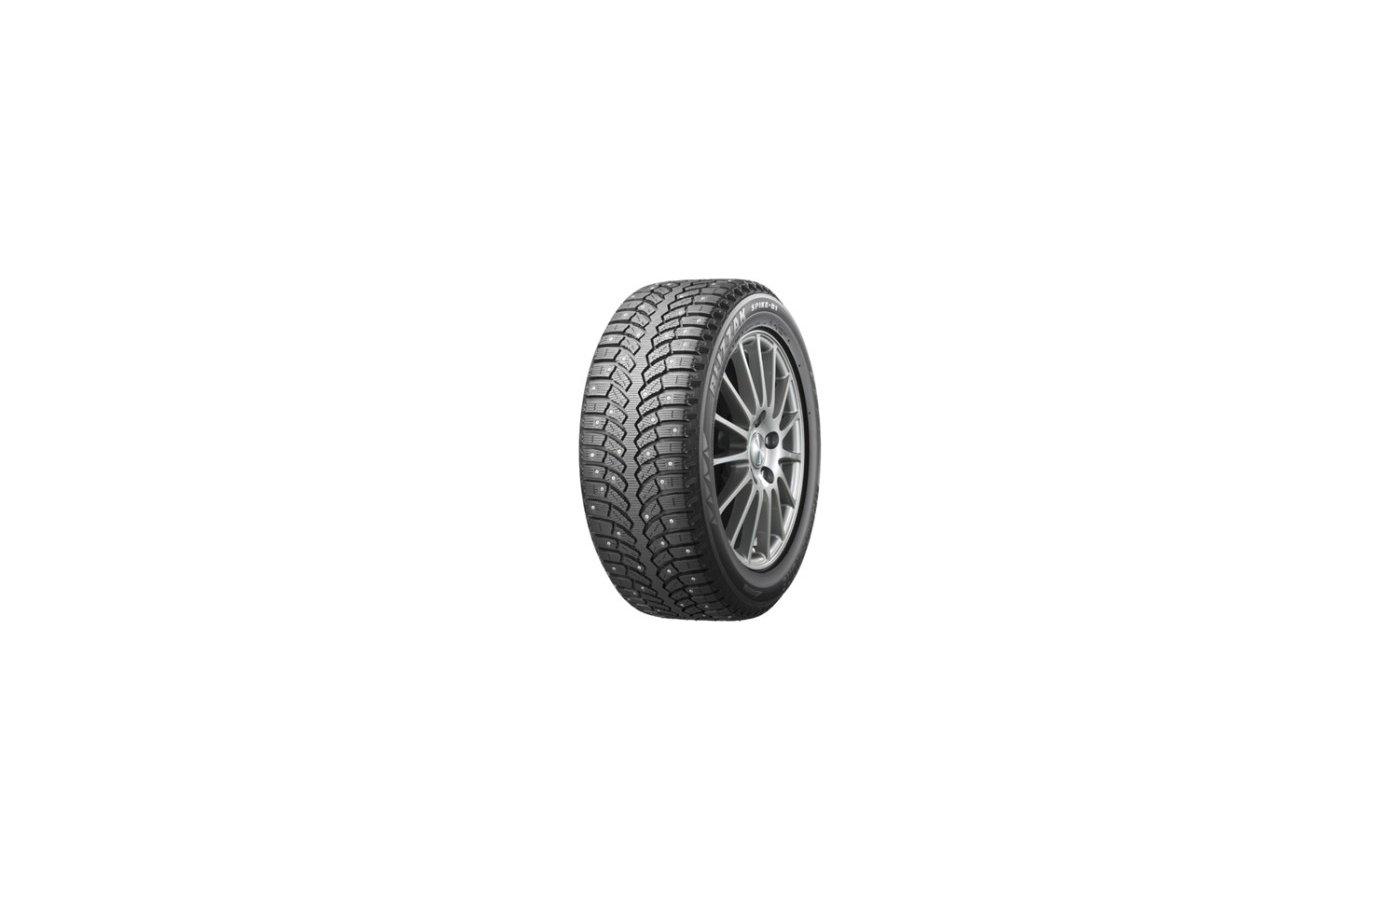 Шина Bridgestone Blizzak Spike-01 215/55 R16 TL 93T шип